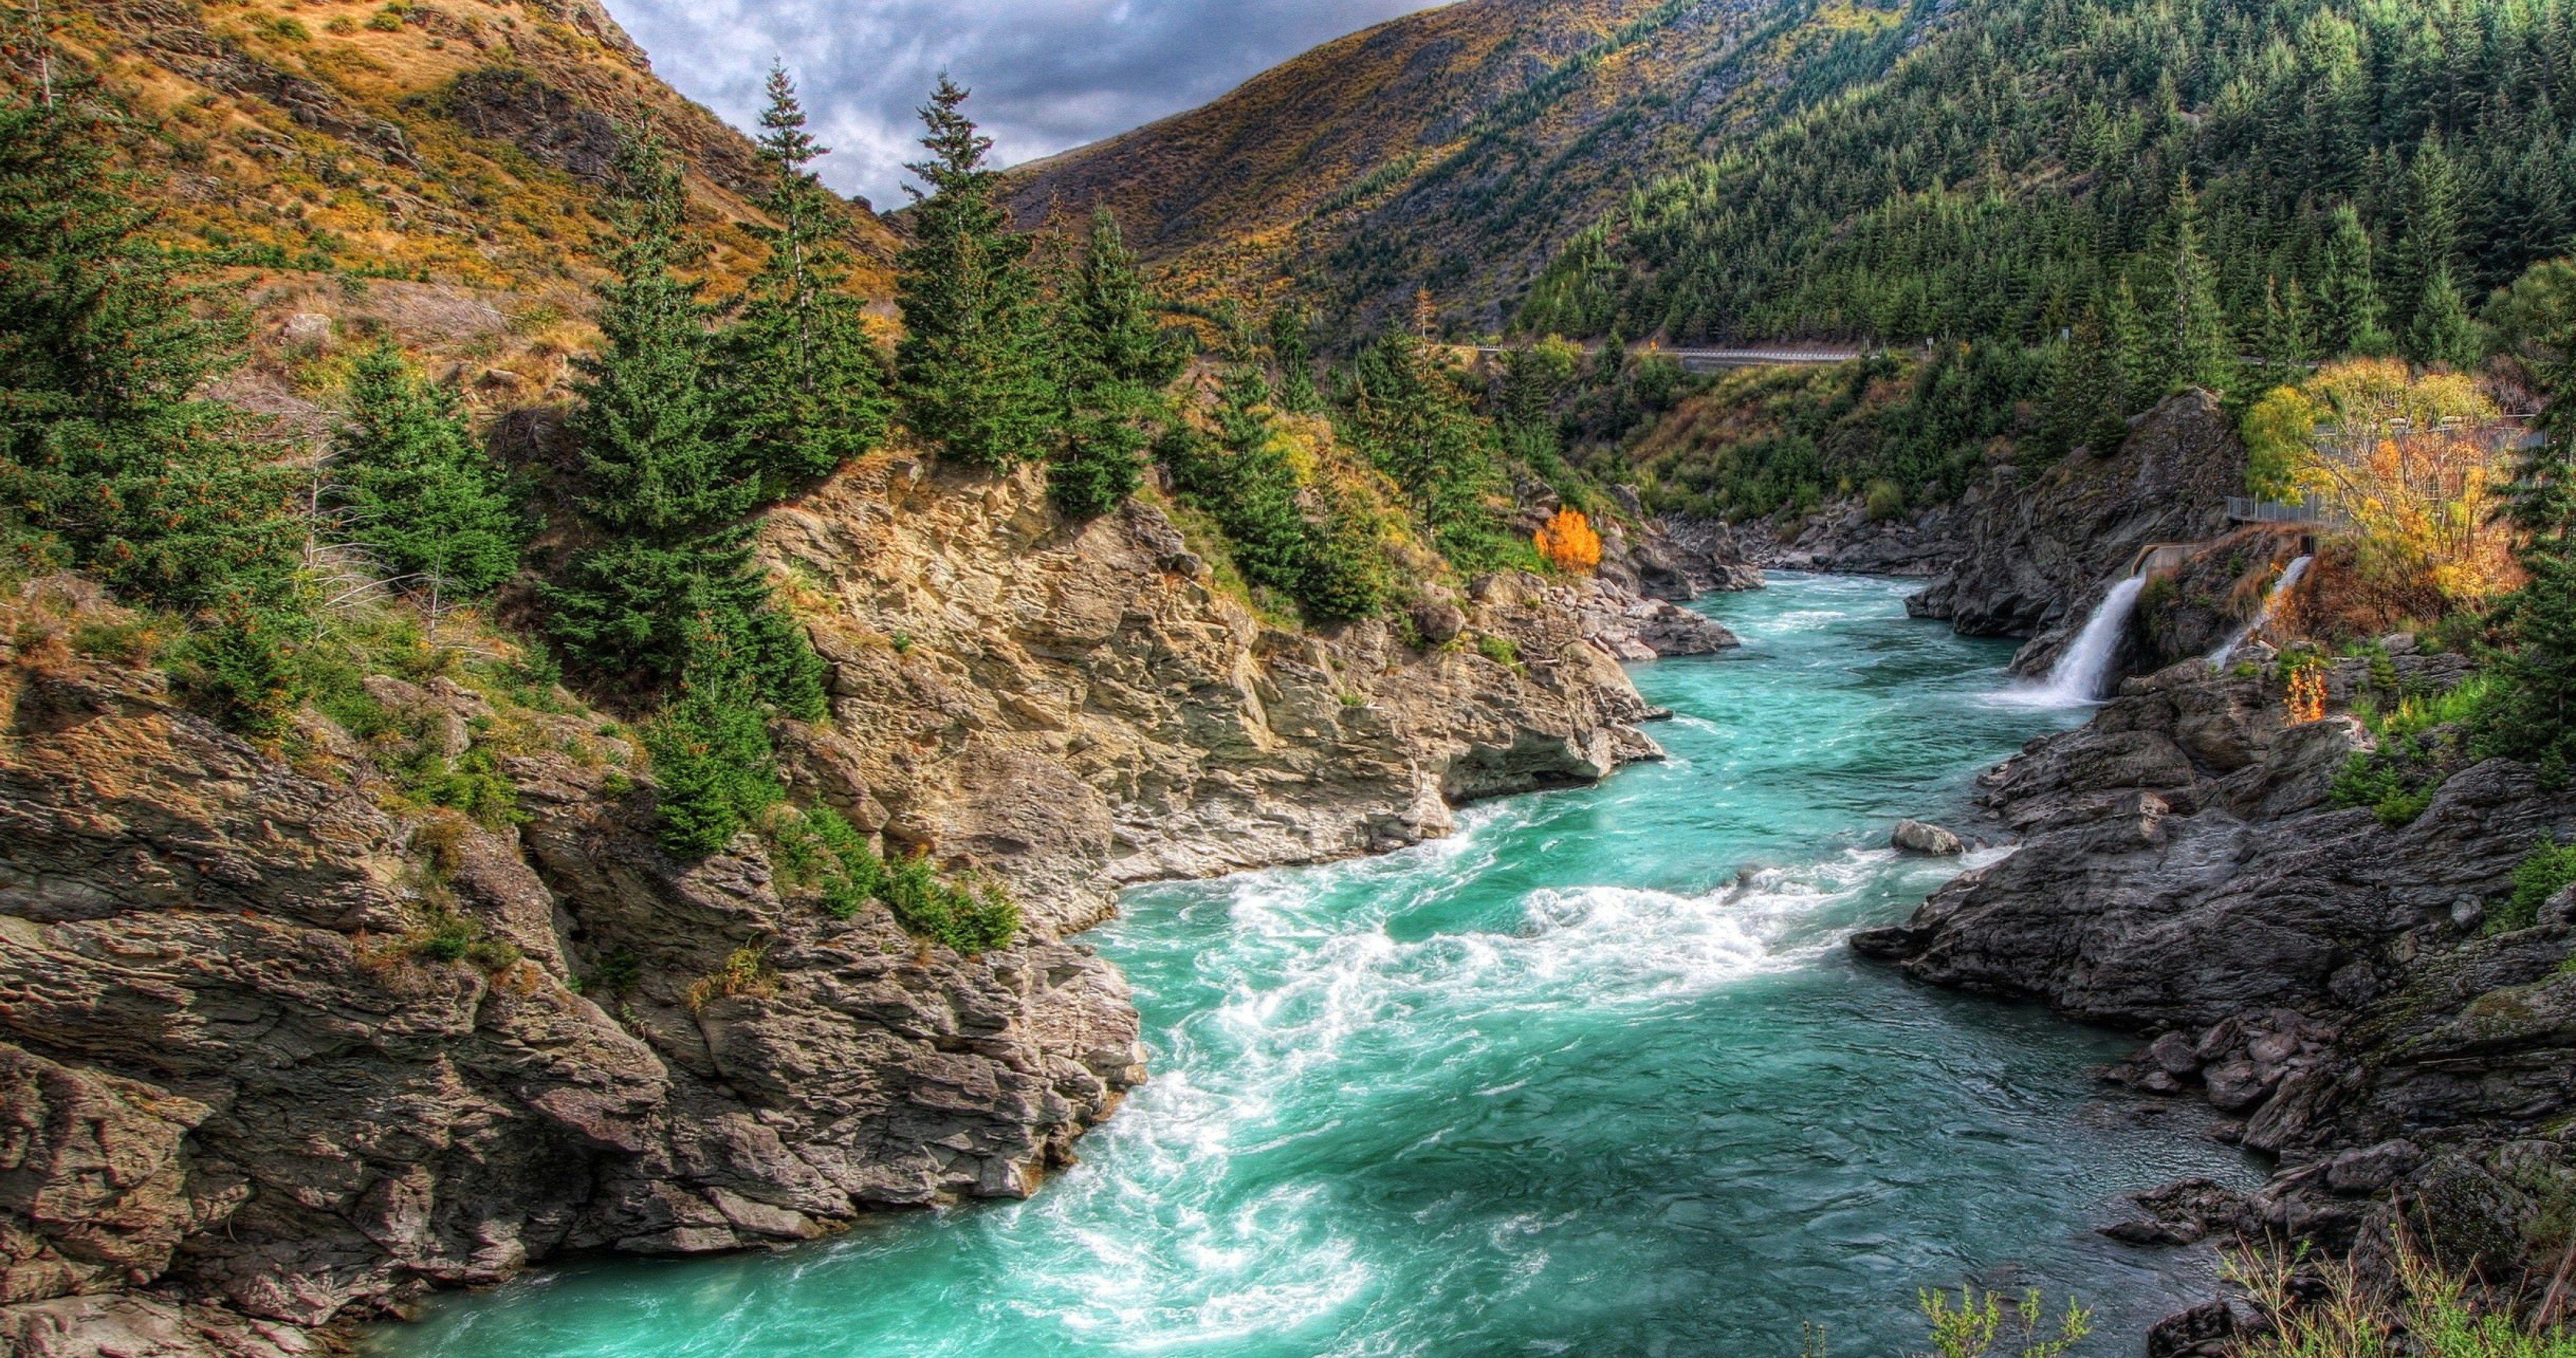 New Zealand River 4K Ultra Hd Wallpaper  Ololoshenka -2866